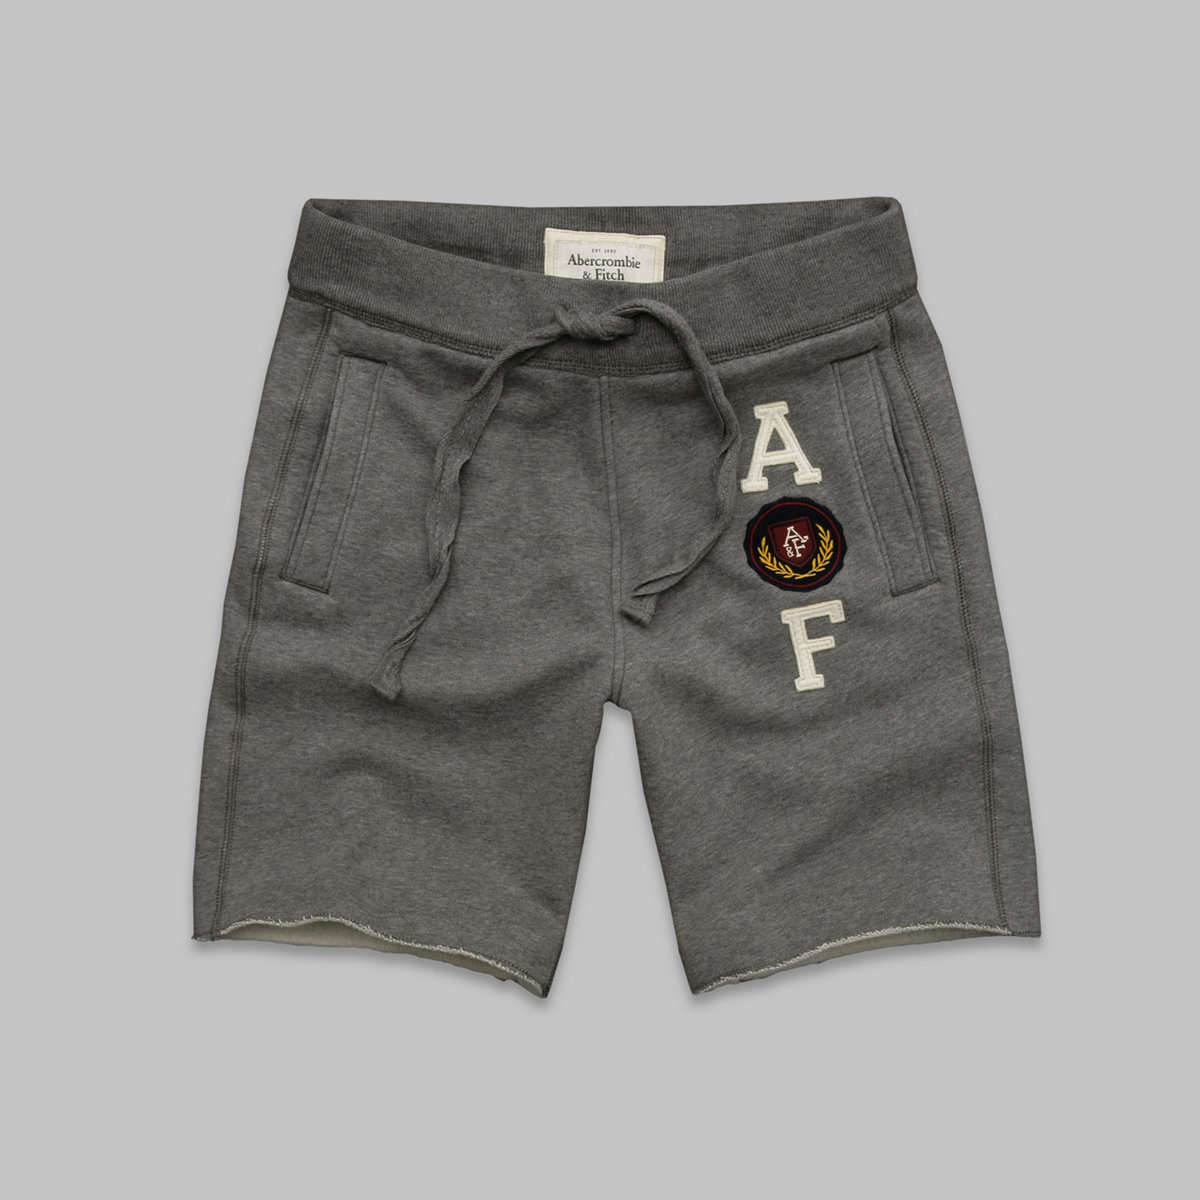 Rollins Pond Shorts